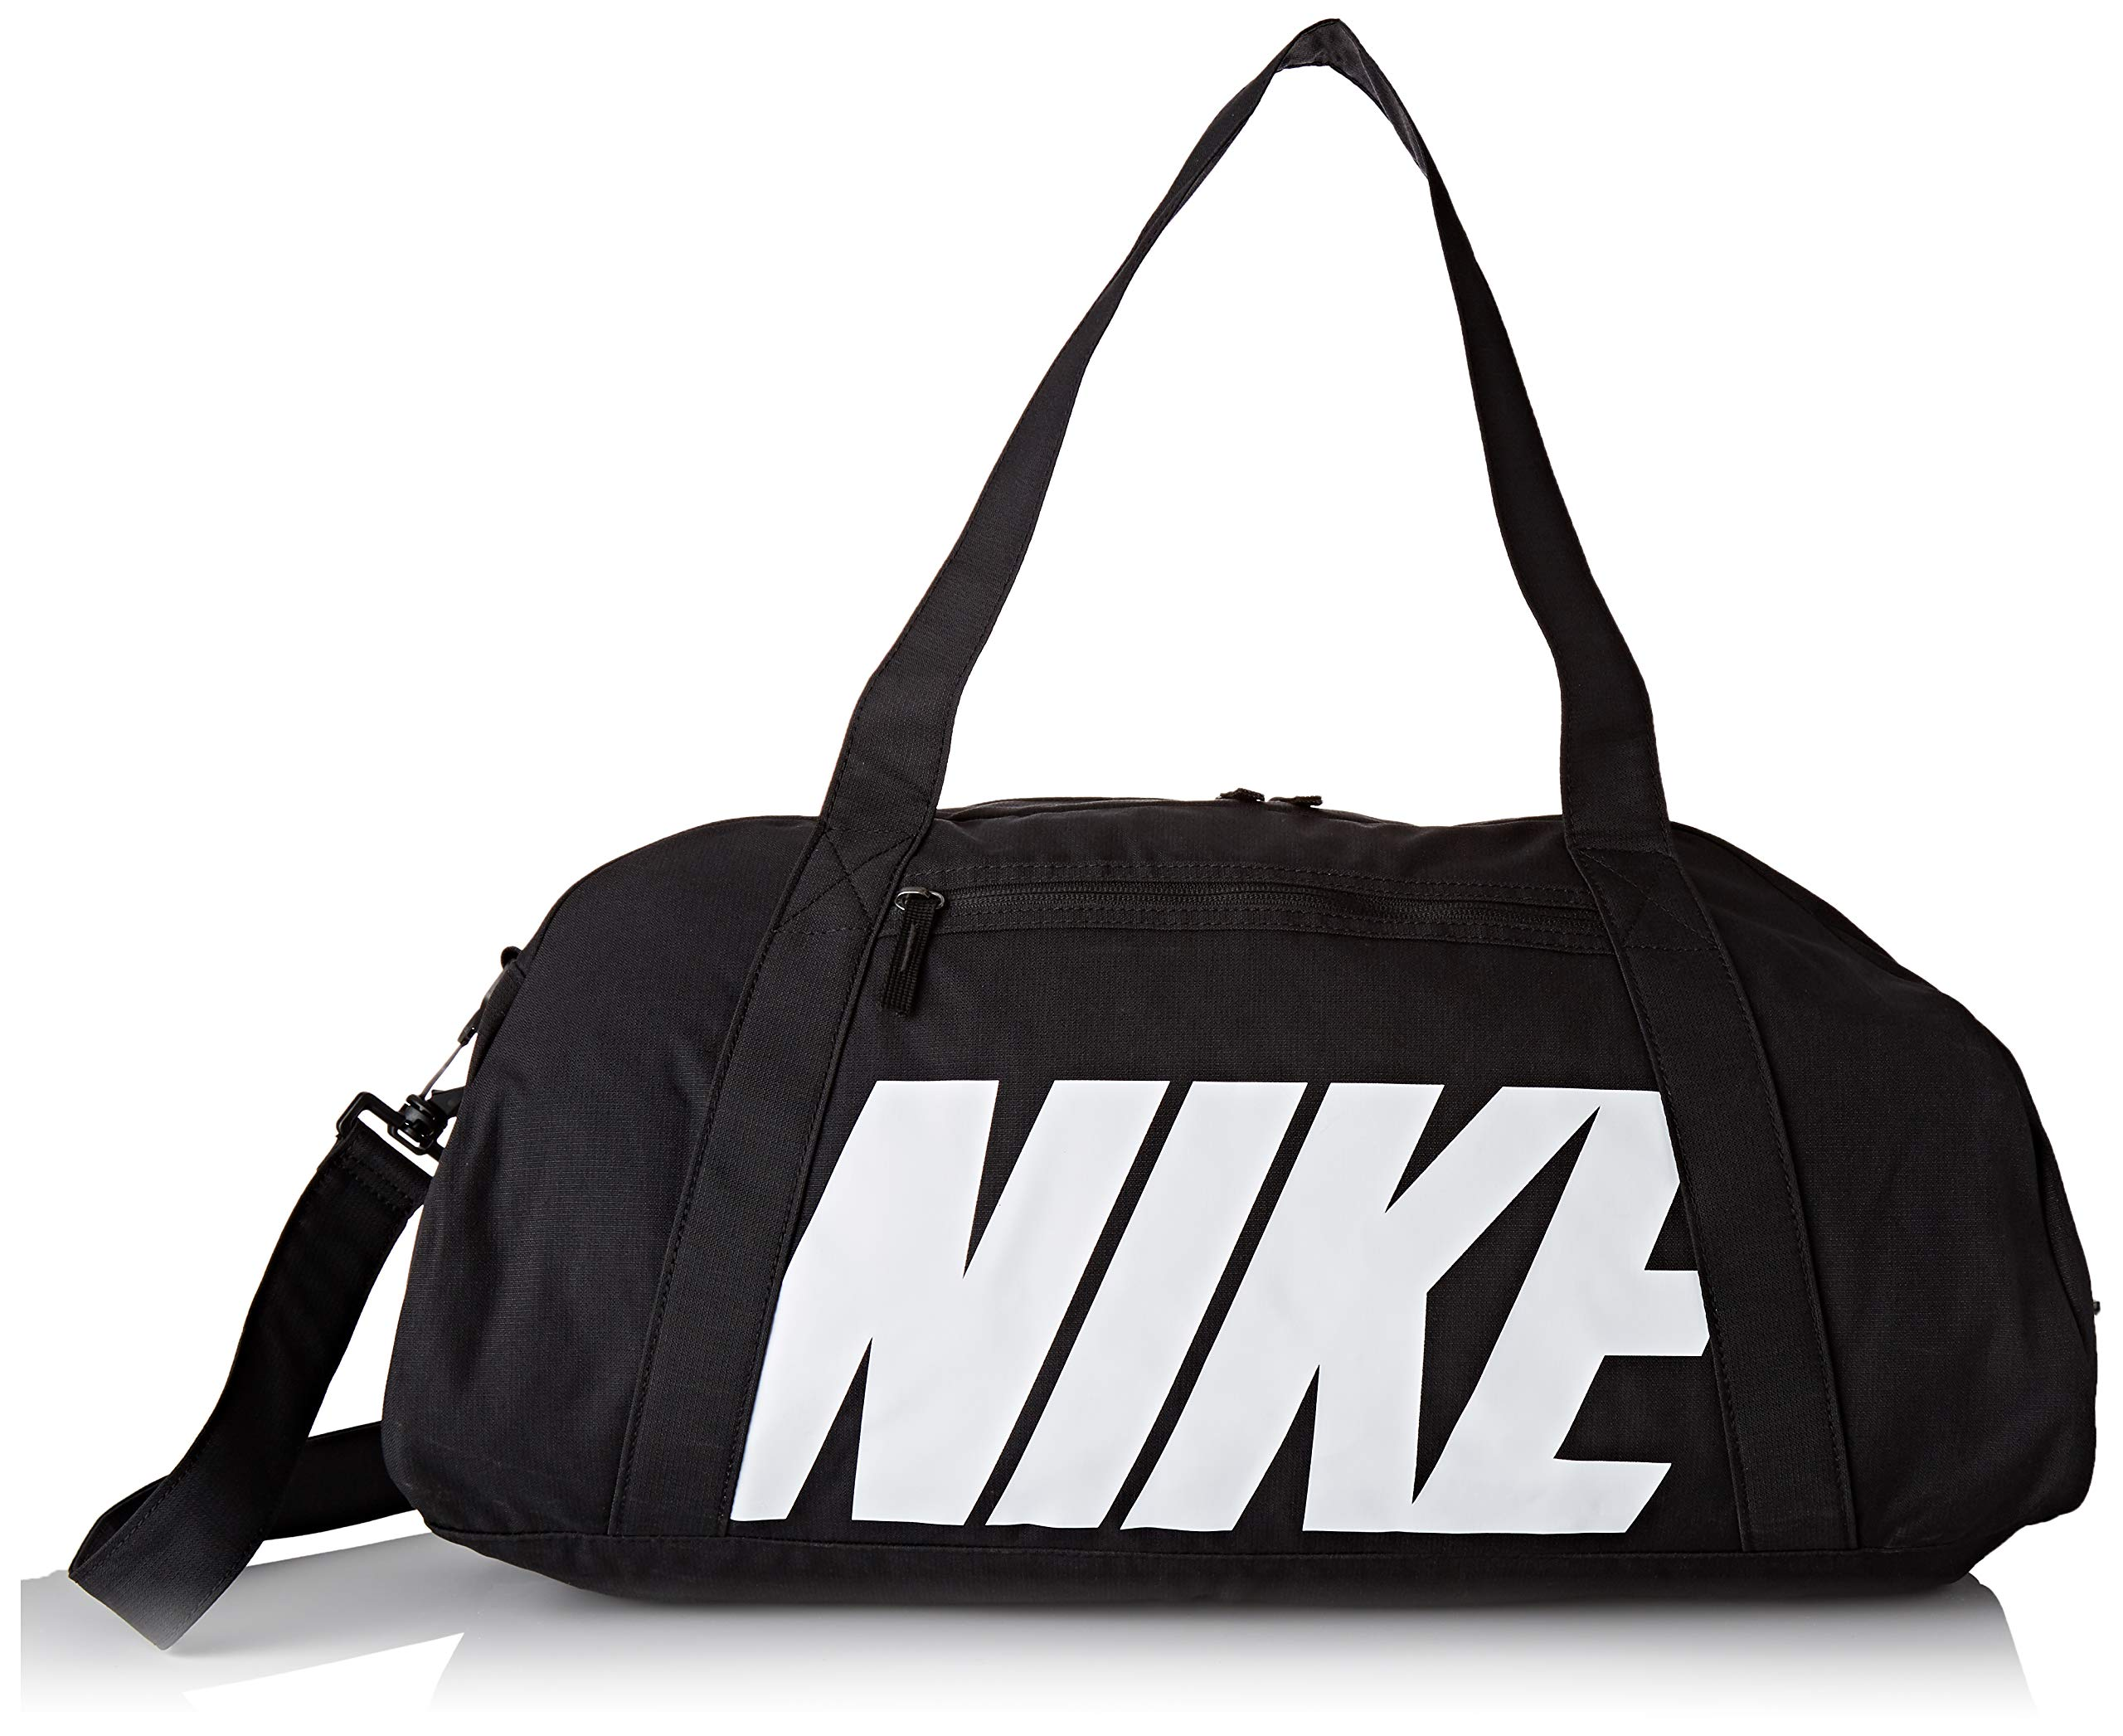 0b10b5bbbfc4 NIKE Women's Gym Club Duffel Bag, Black/Black/White, One Size